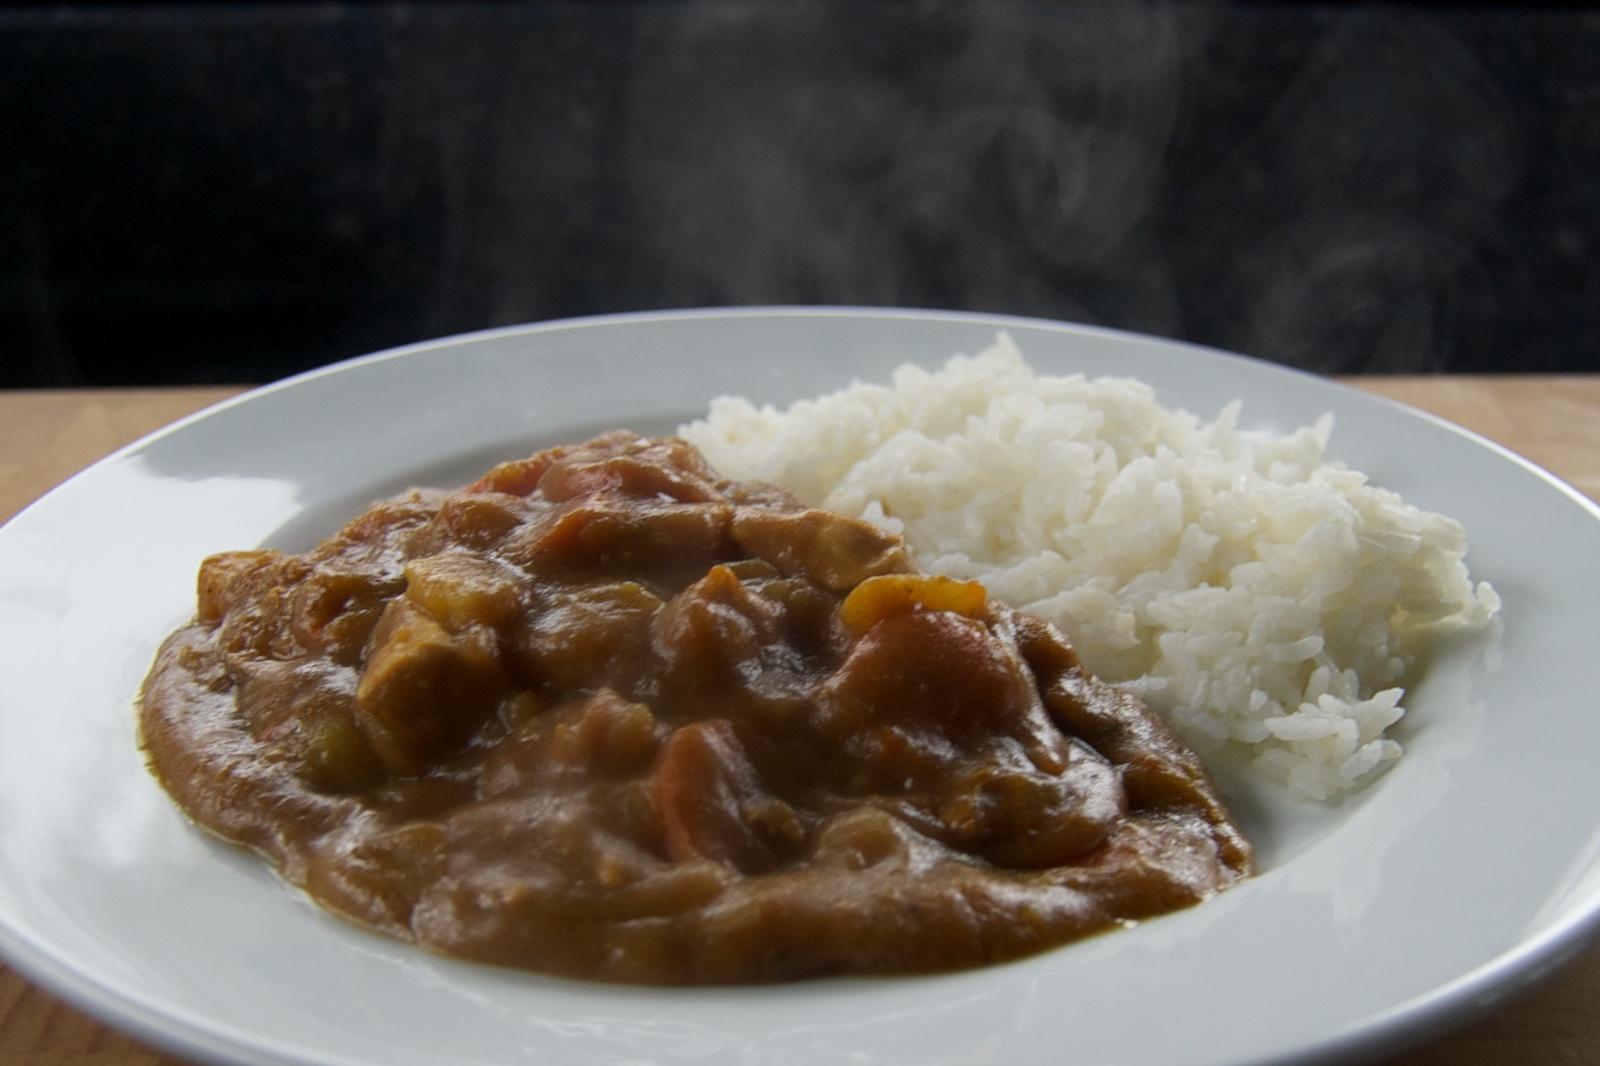 http://blog.rickk.com/food/2011/10/22/ate.2011.10.22.d.jpg